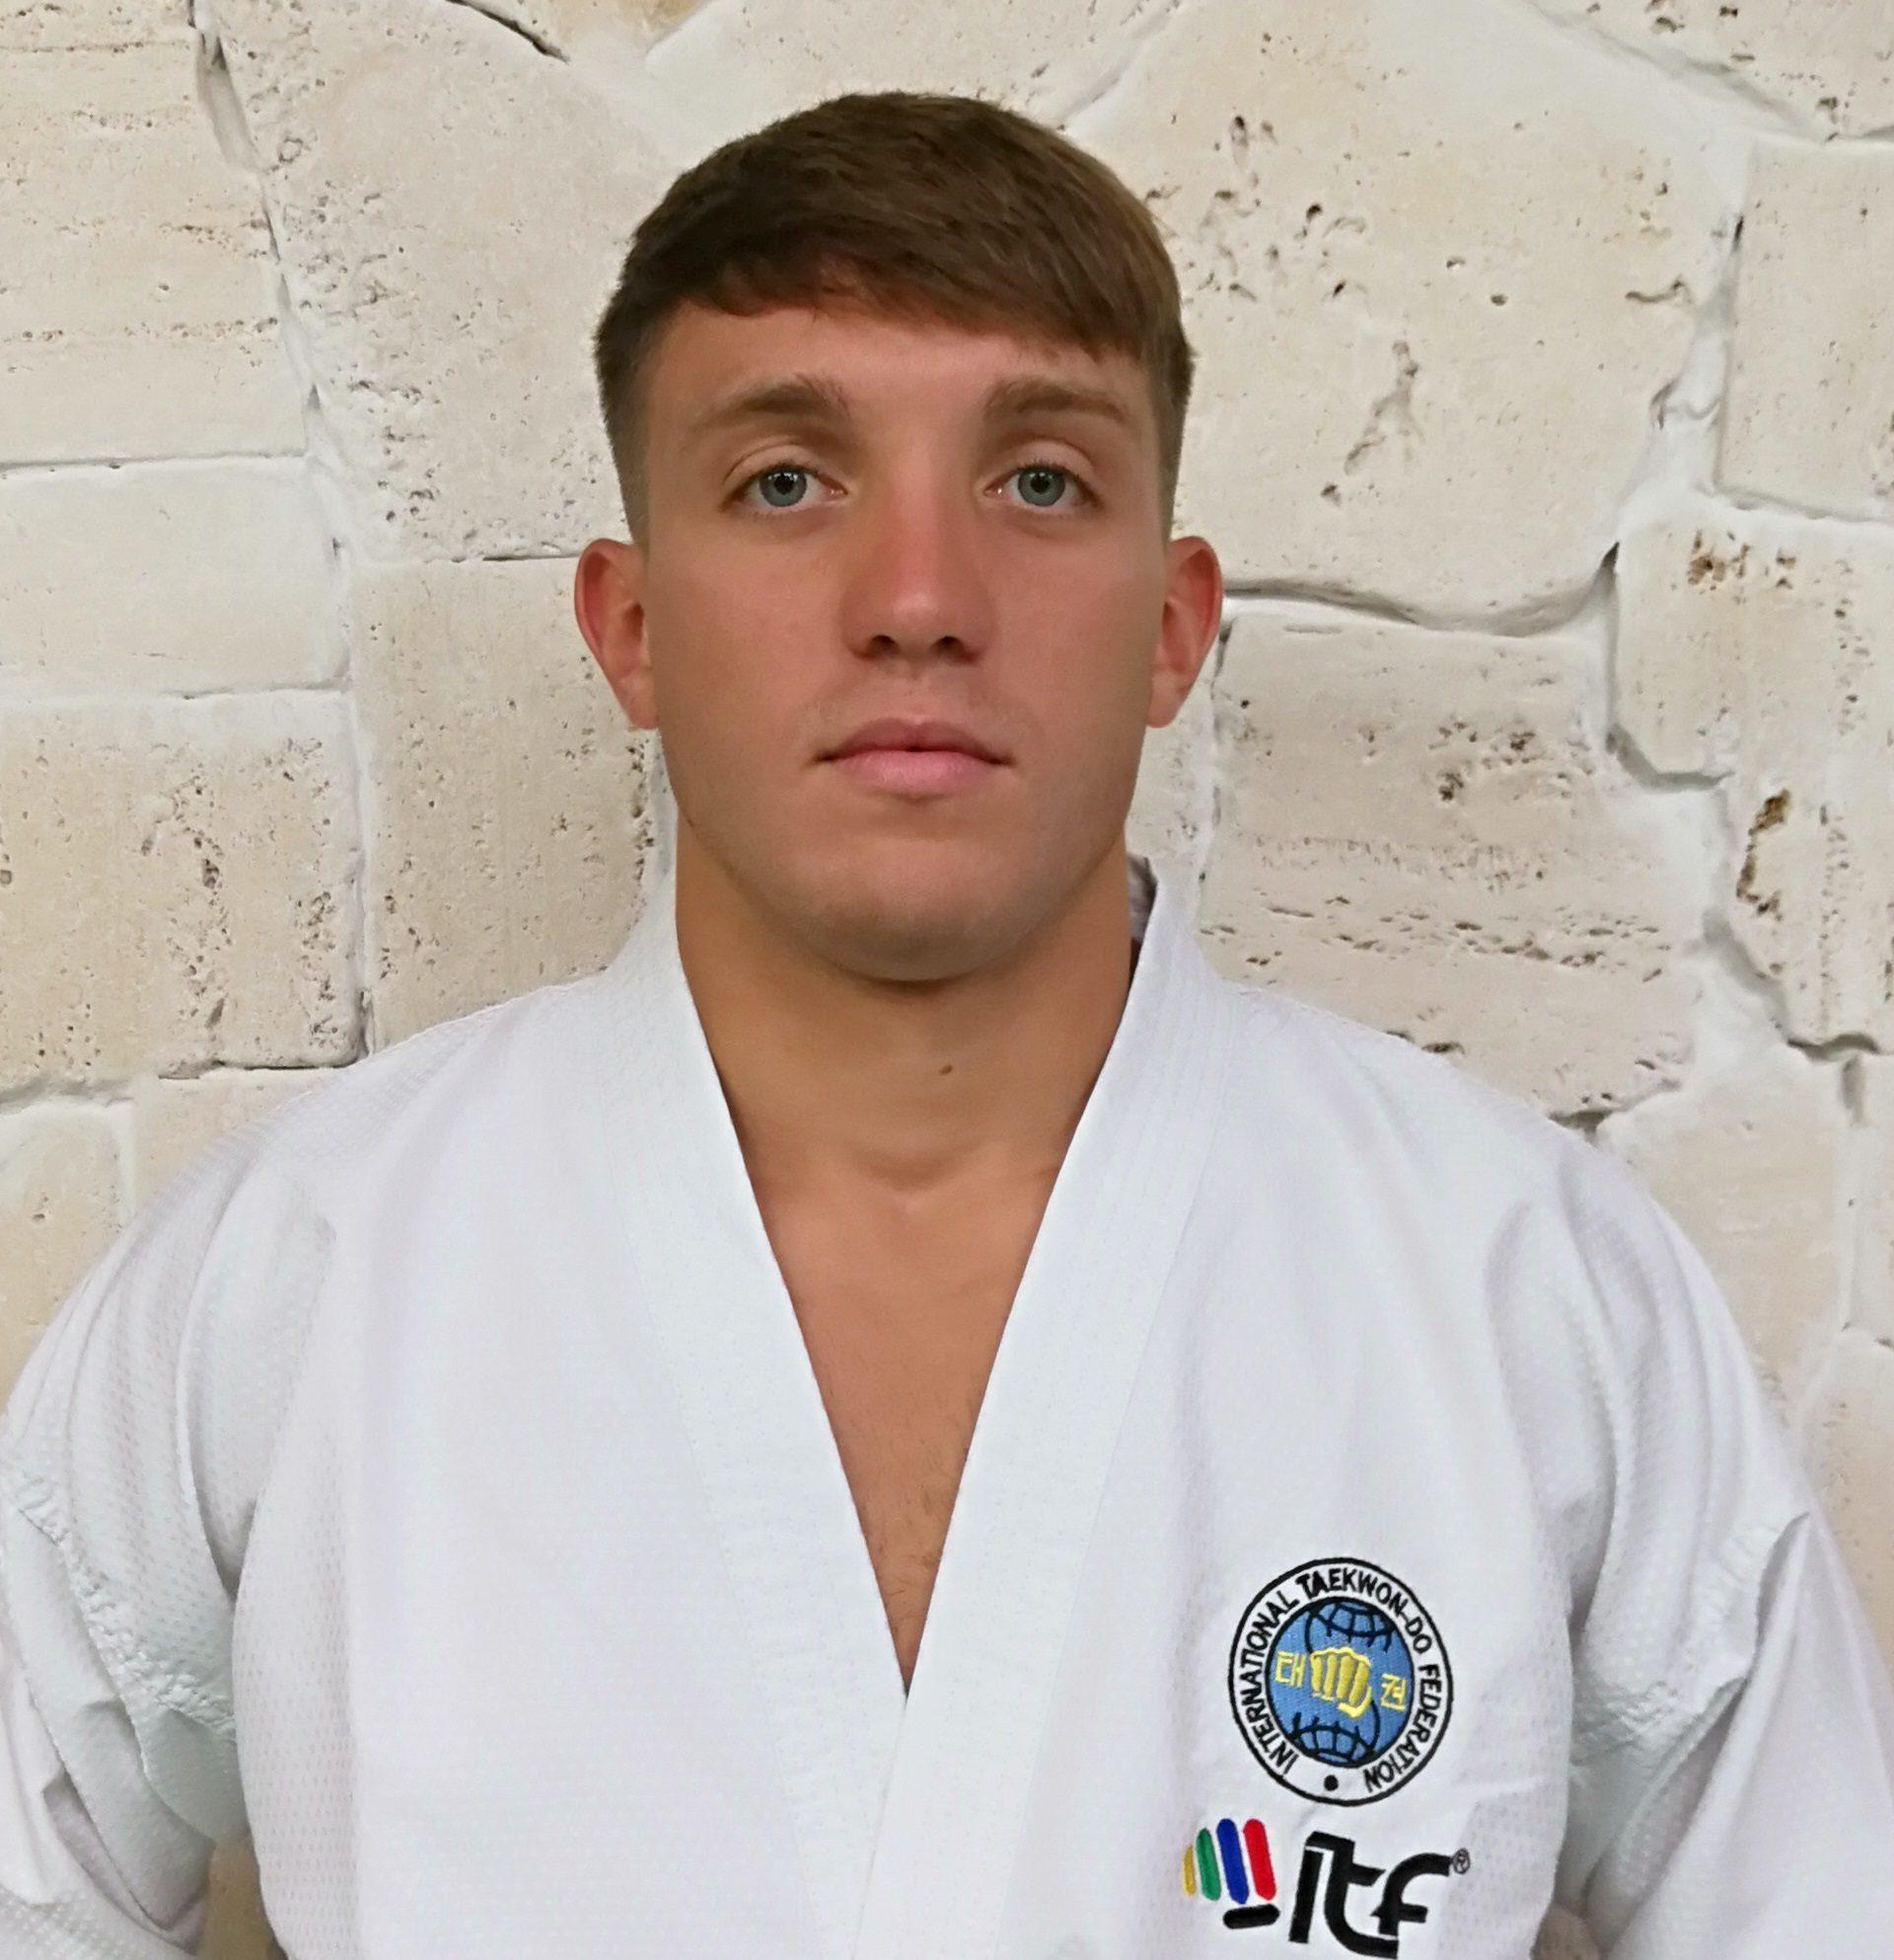 Alessandro Castelnuovo